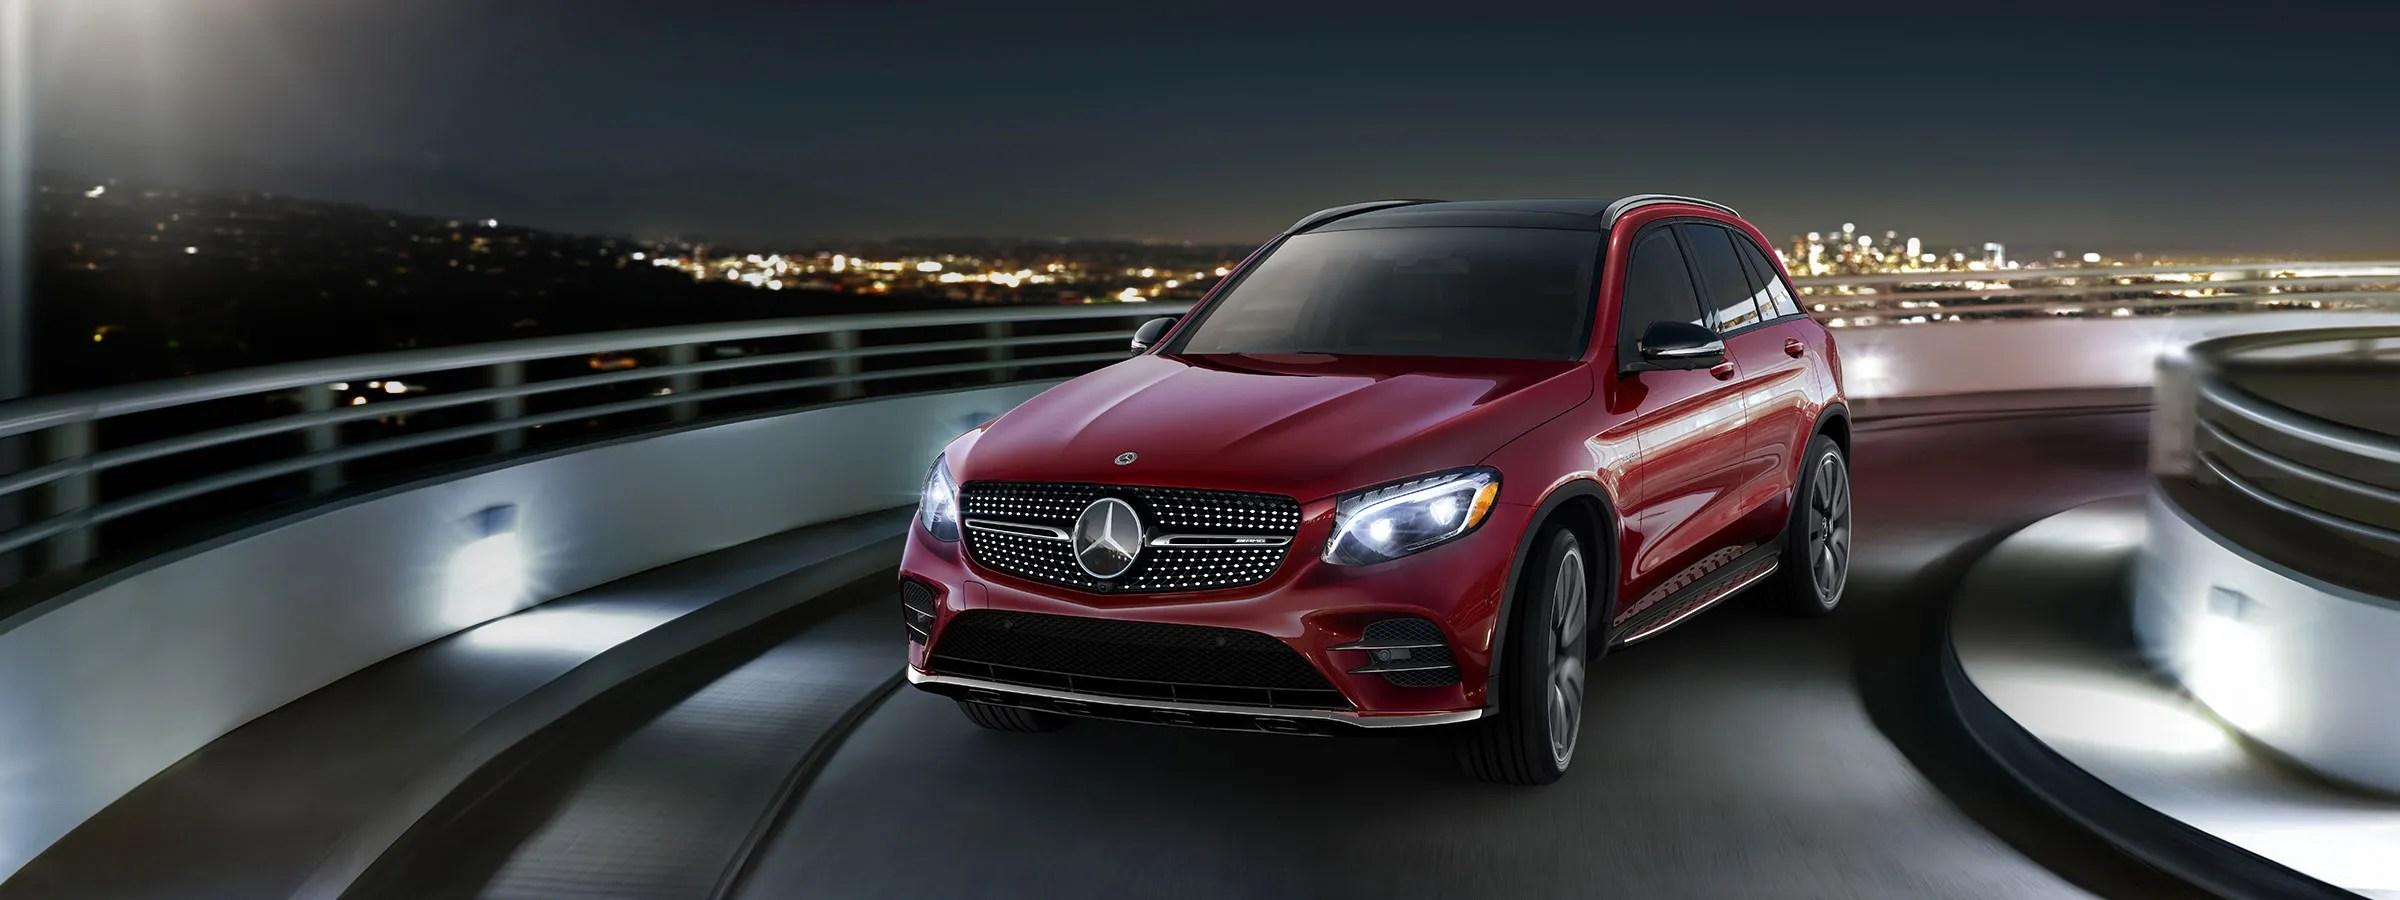 2018 Mercedes AMG GLC 4MATIC SUV Mercedes Benz